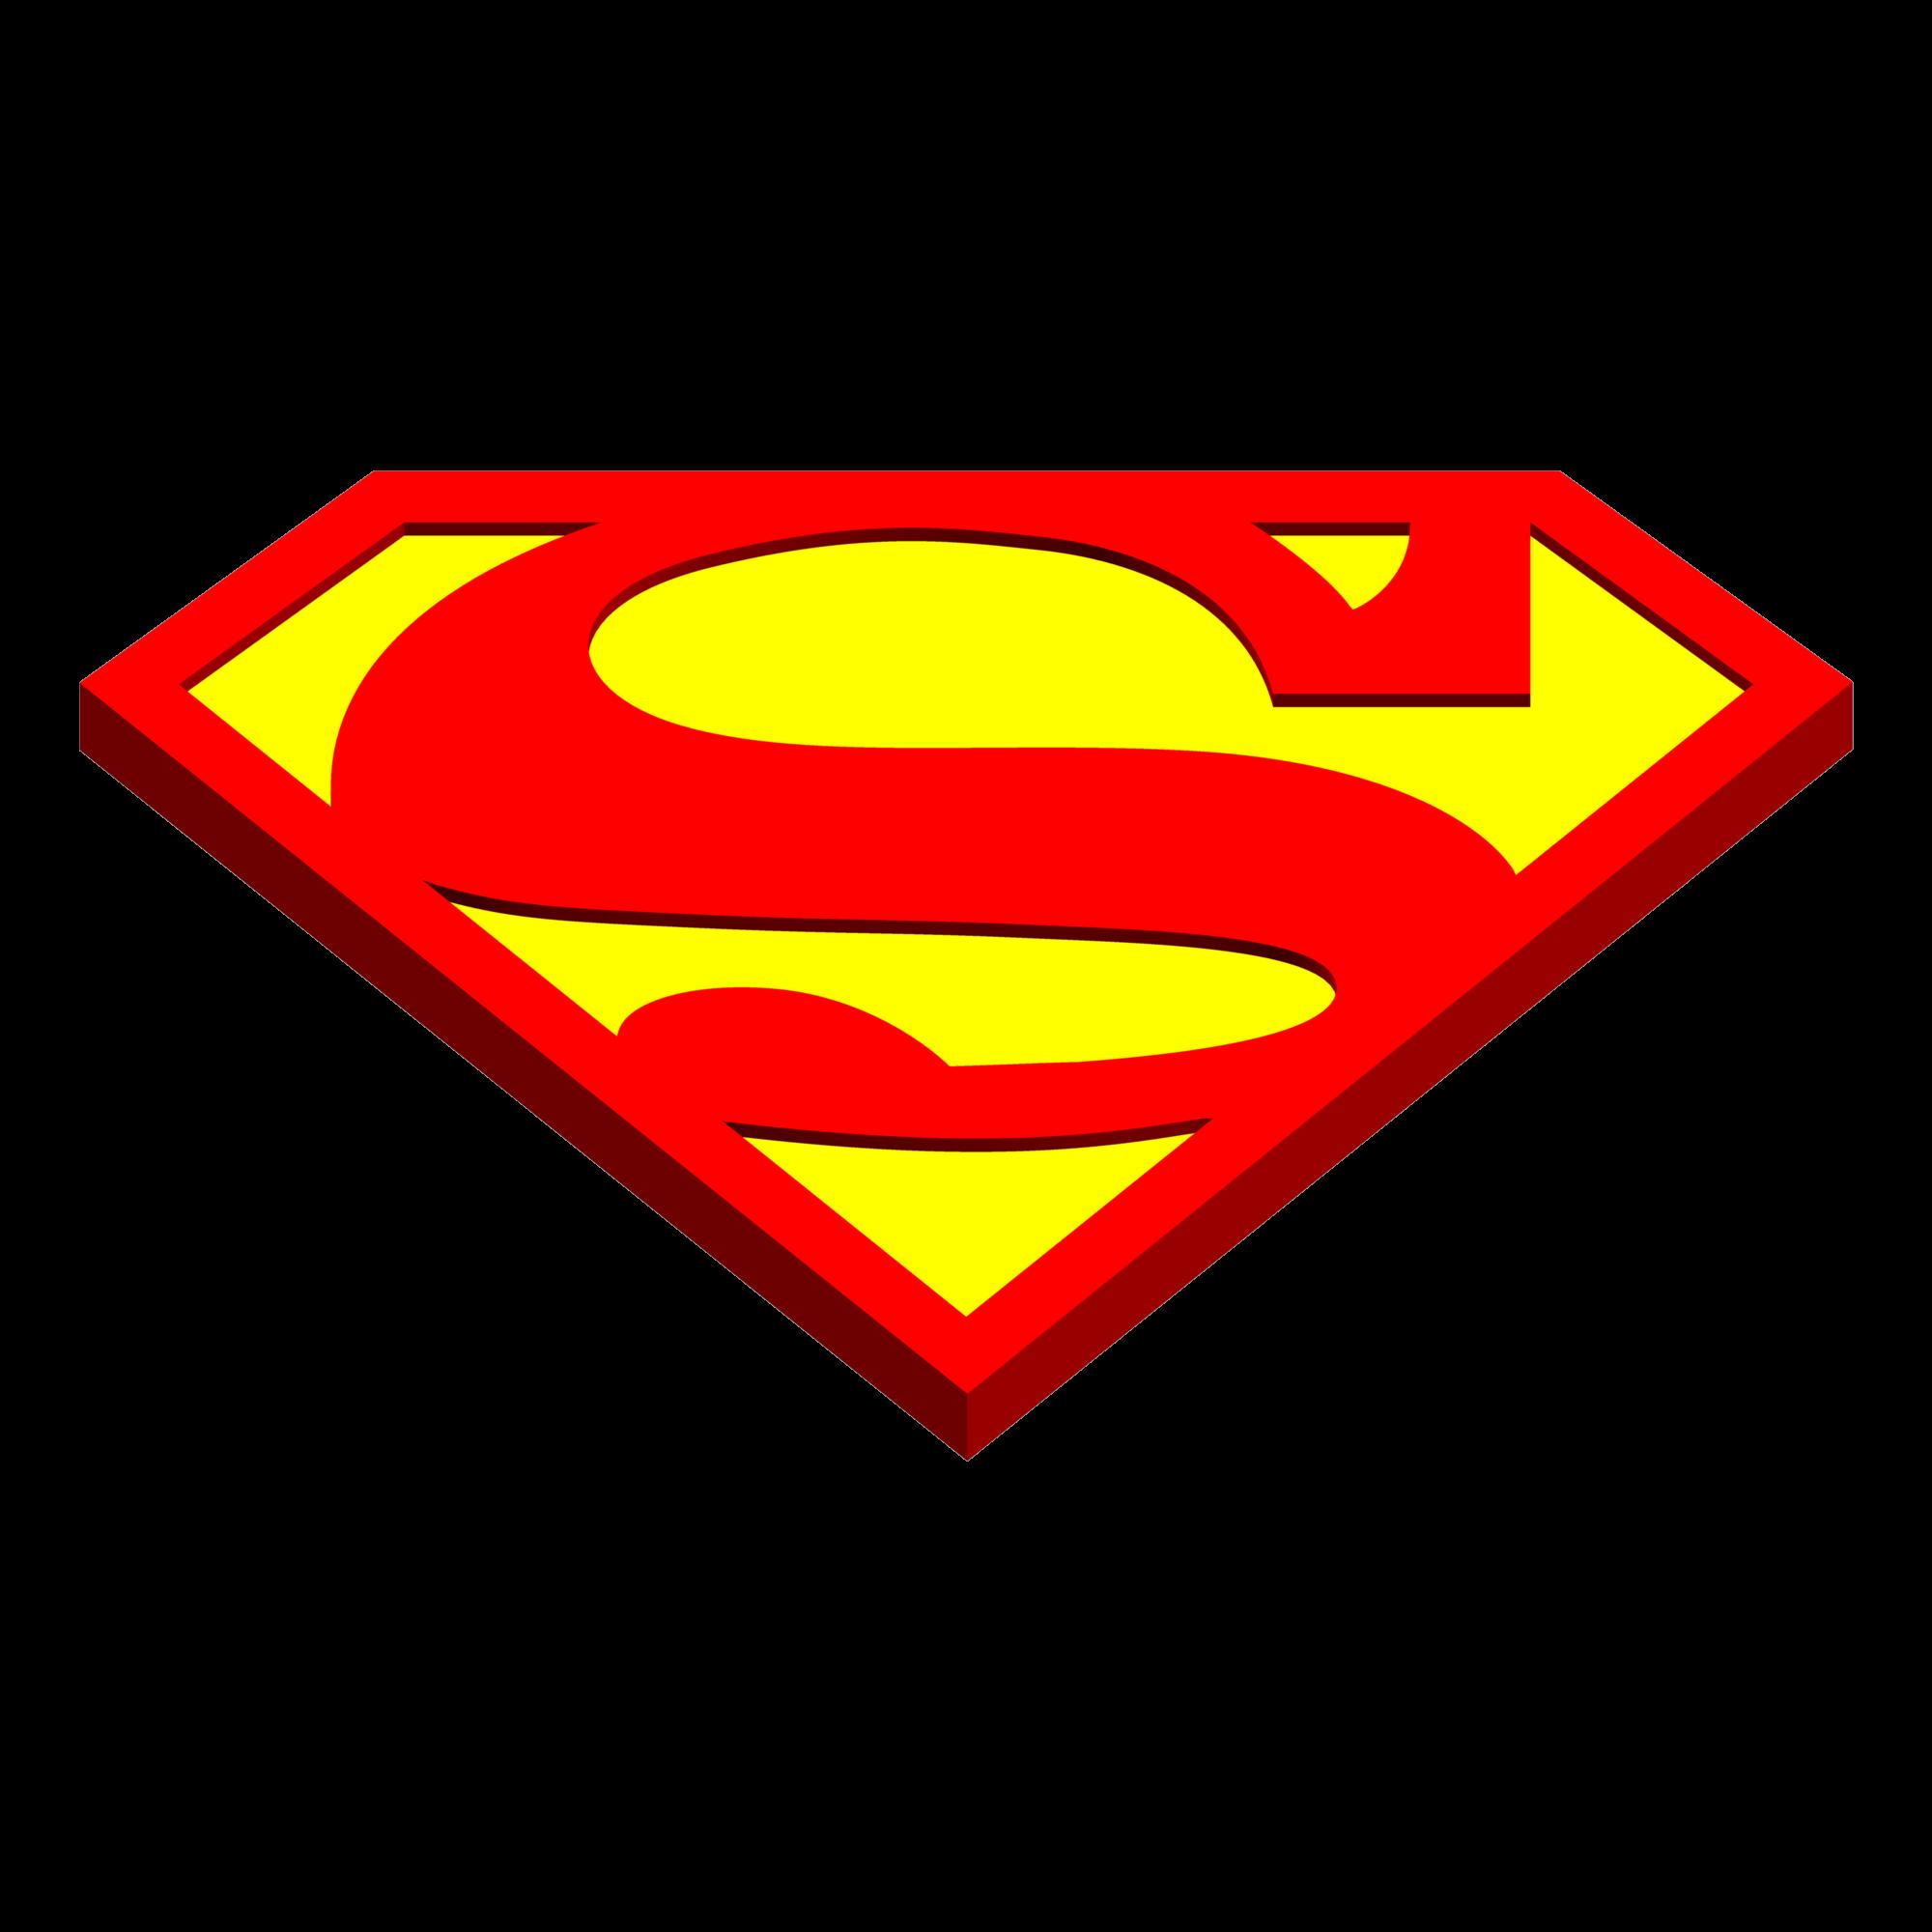 Clipart superman logo image royalty free stock Superman Logo Png Cartoon image royalty free stock